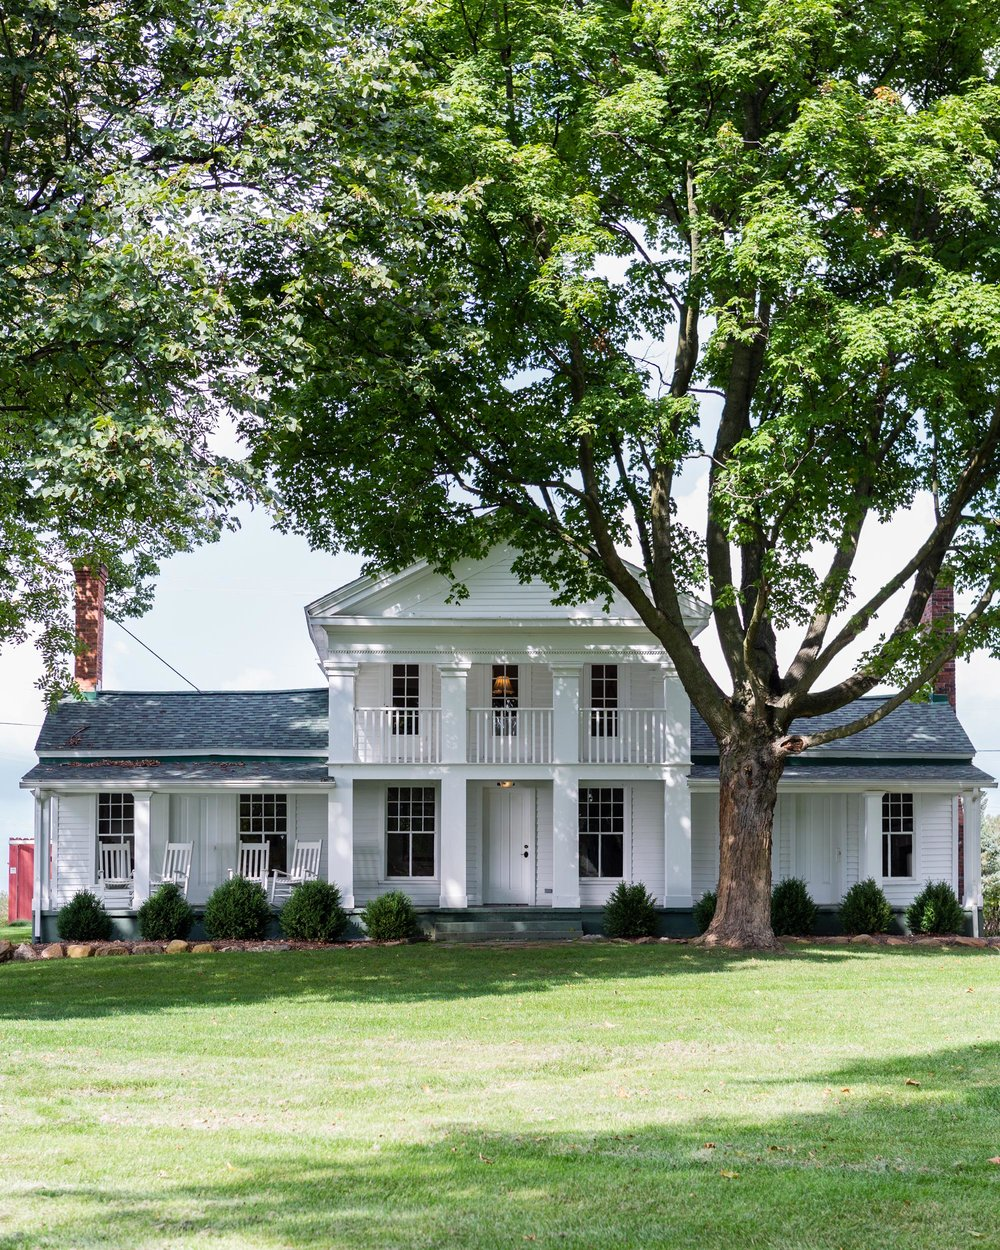 Cornman's farmhouse, home to the chef's kitchen.